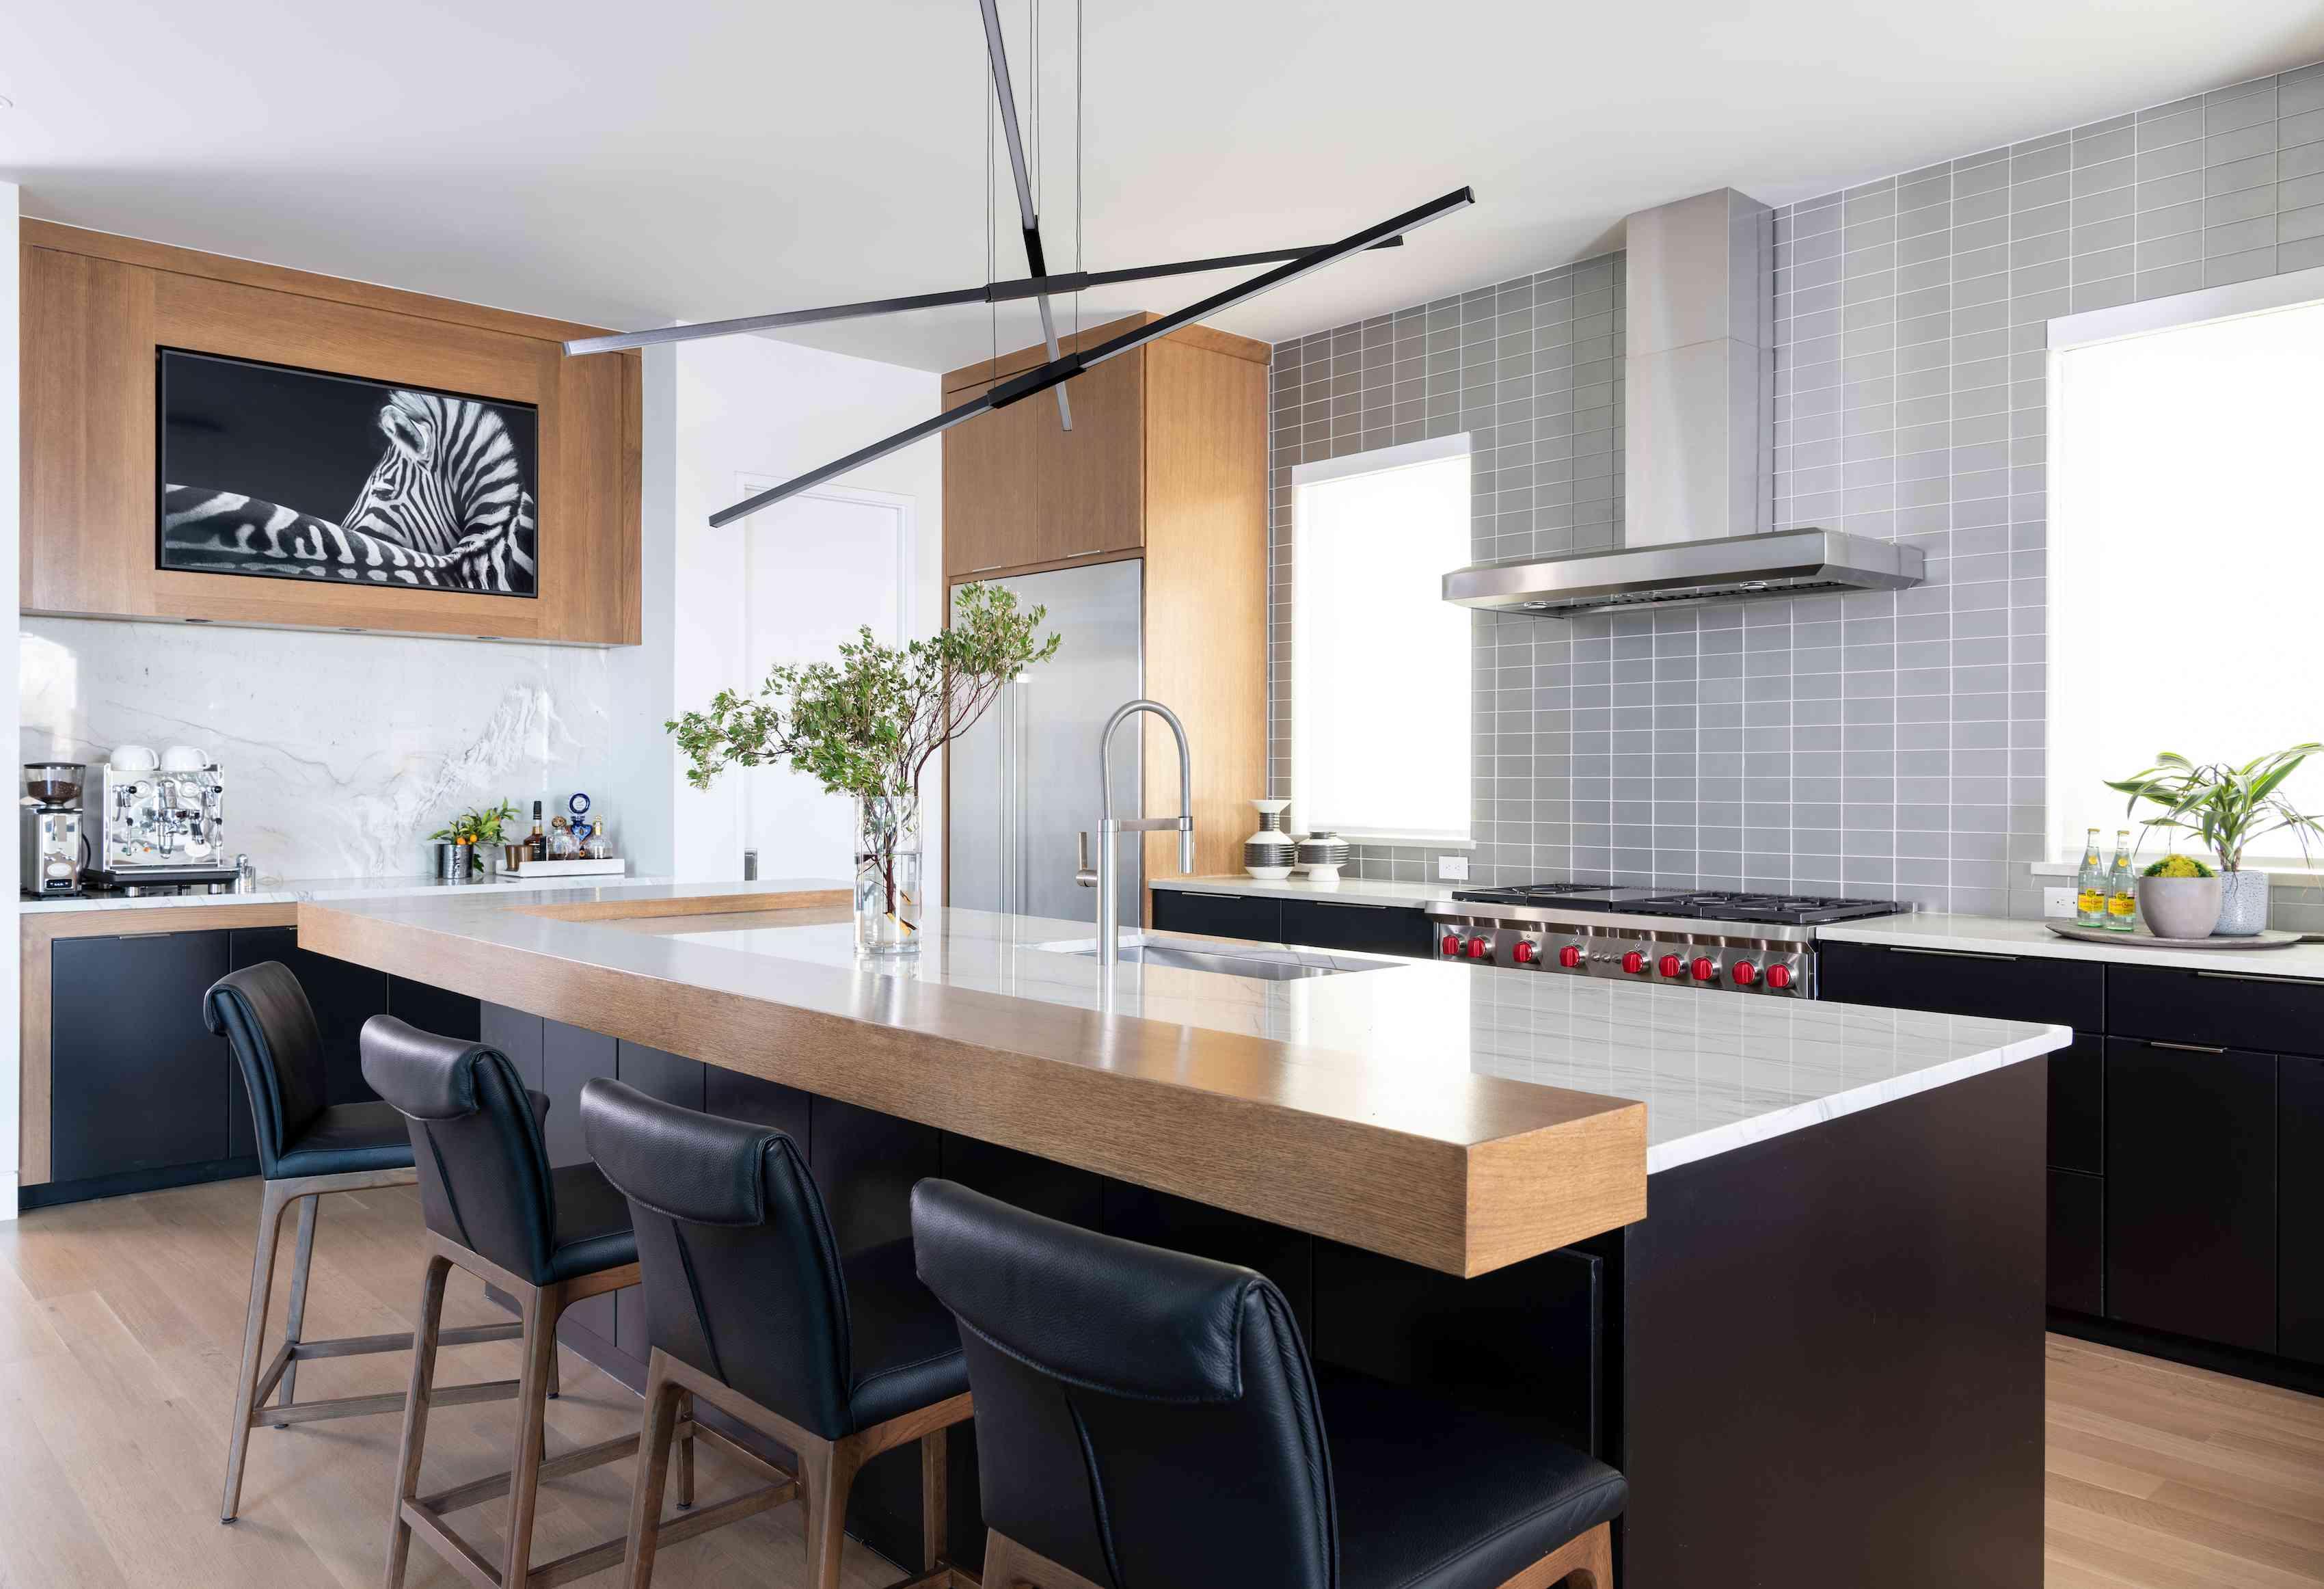 Bachelor pad kitchen